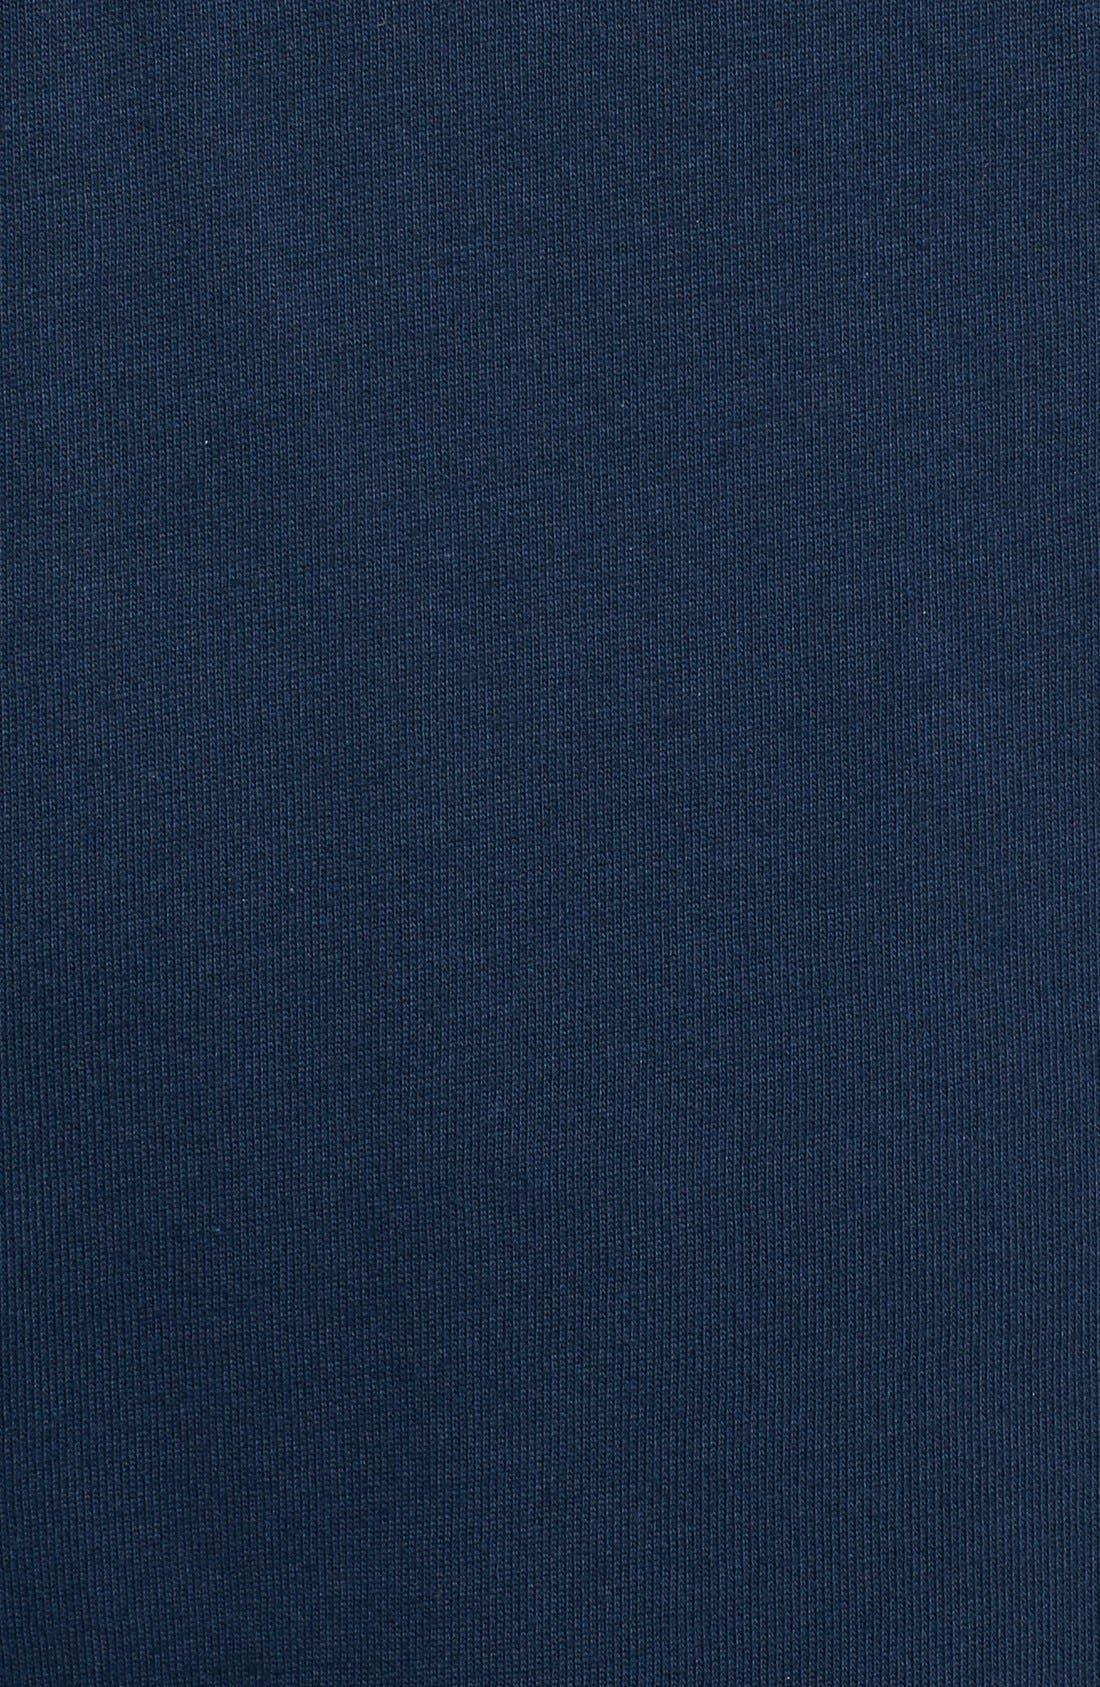 Alternate Image 3  - BOSS HUGO BOSS 'Innovation 3' Lounge Pants